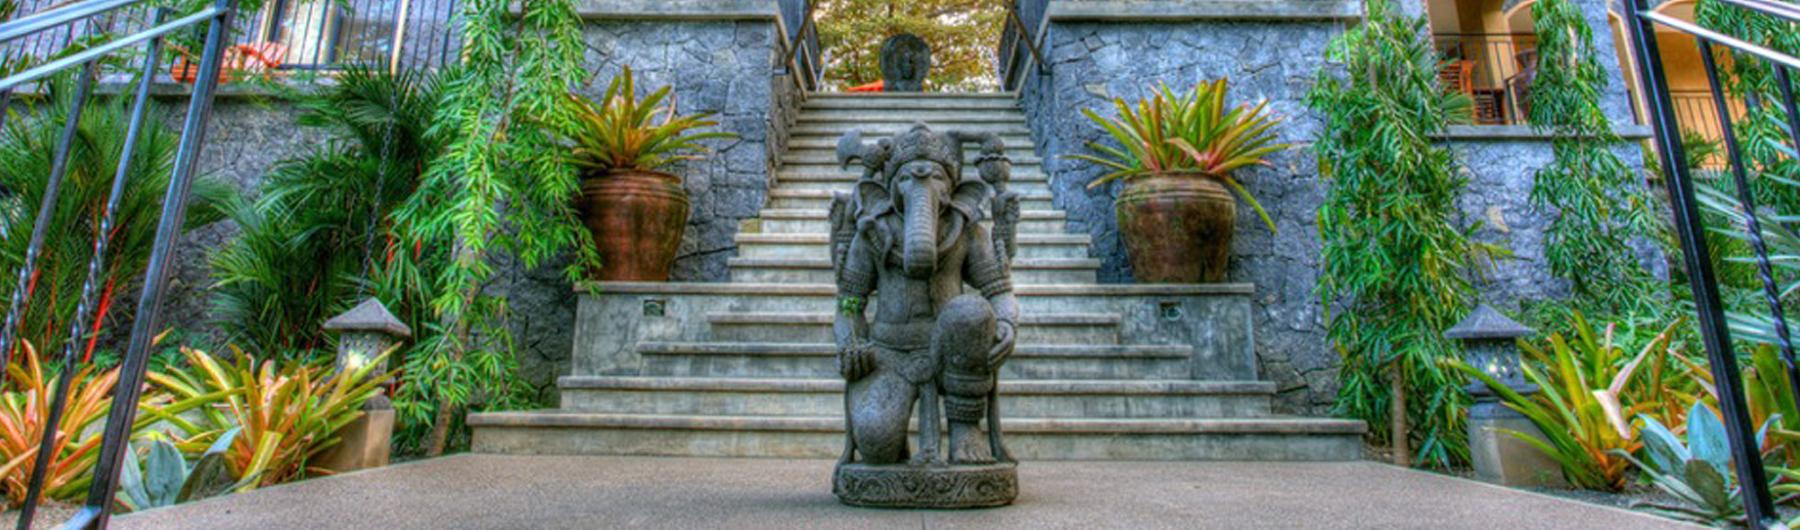 2019 Retreat Yo'Self - Bodhi Tree Yoga Resort